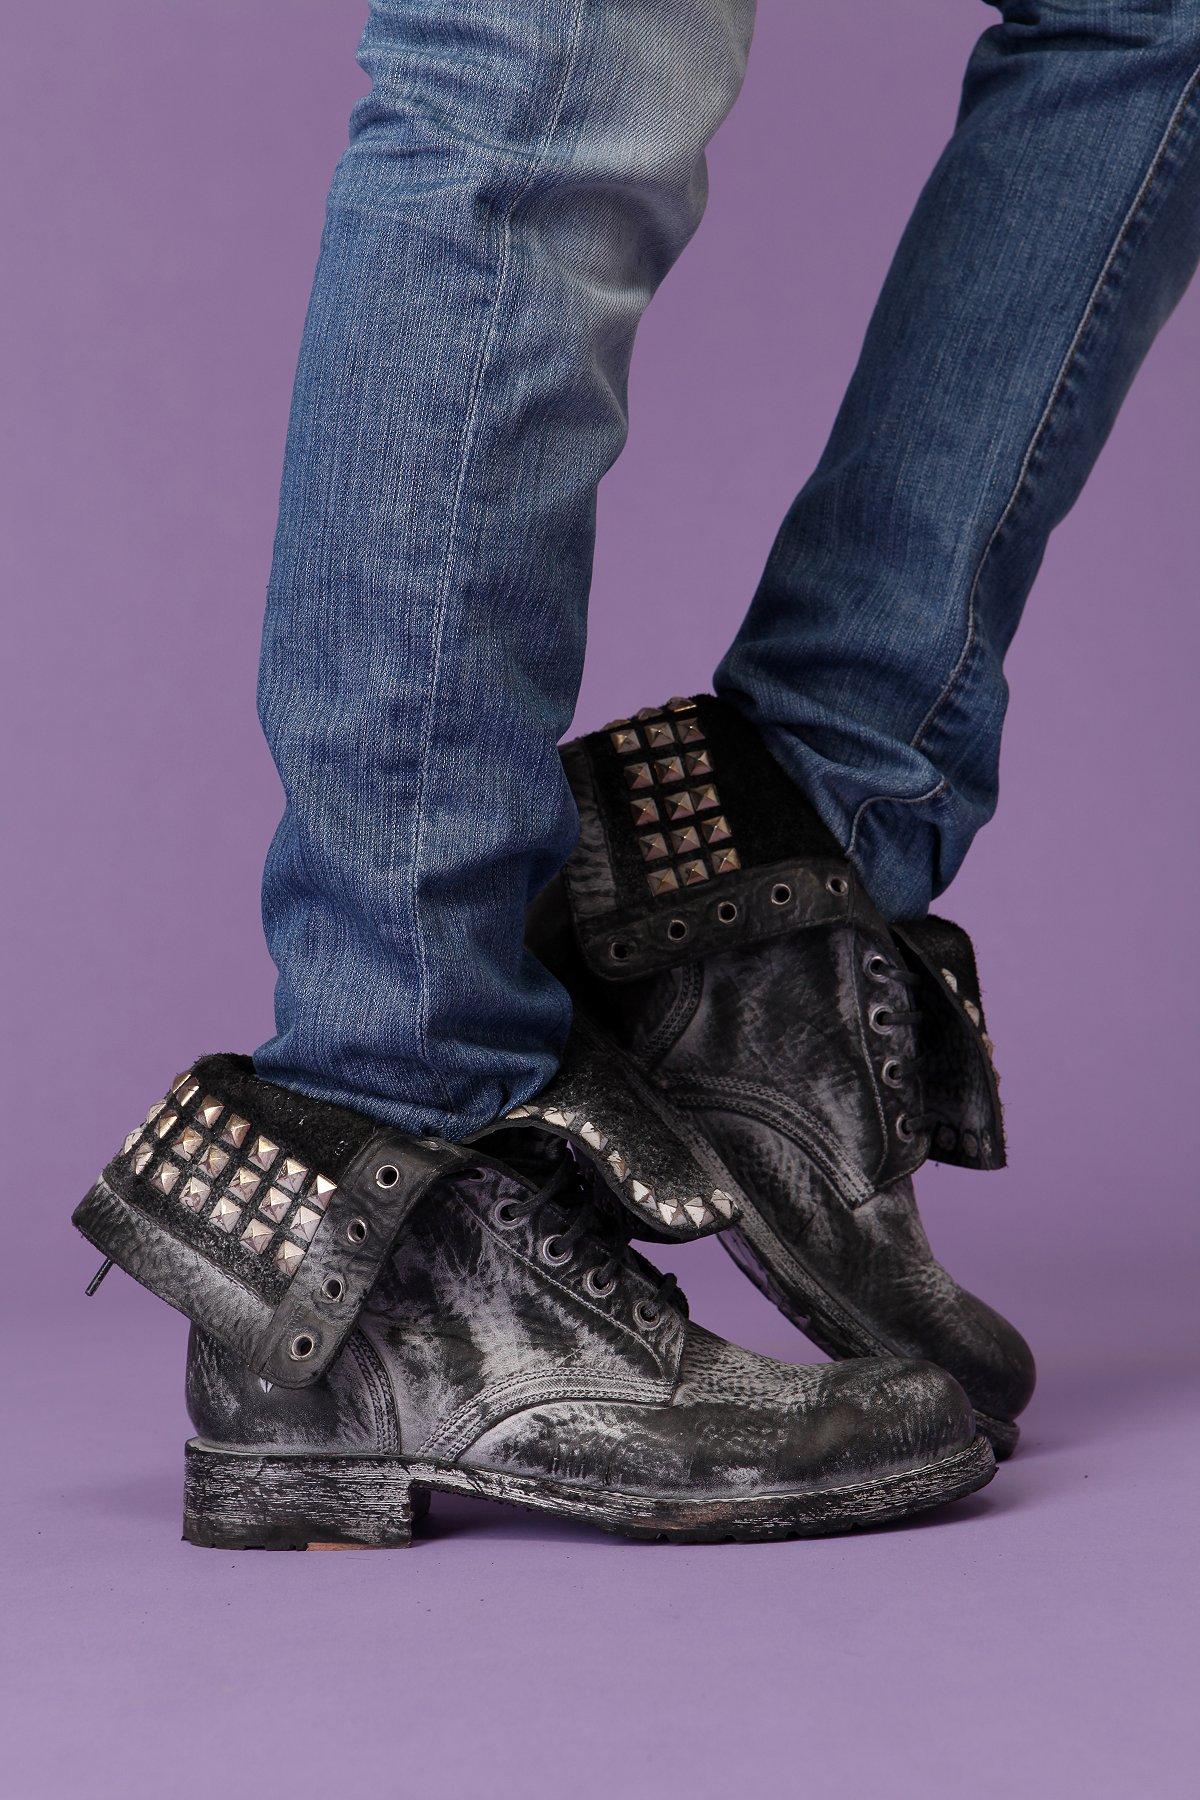 Bleach Black Boot by Frye